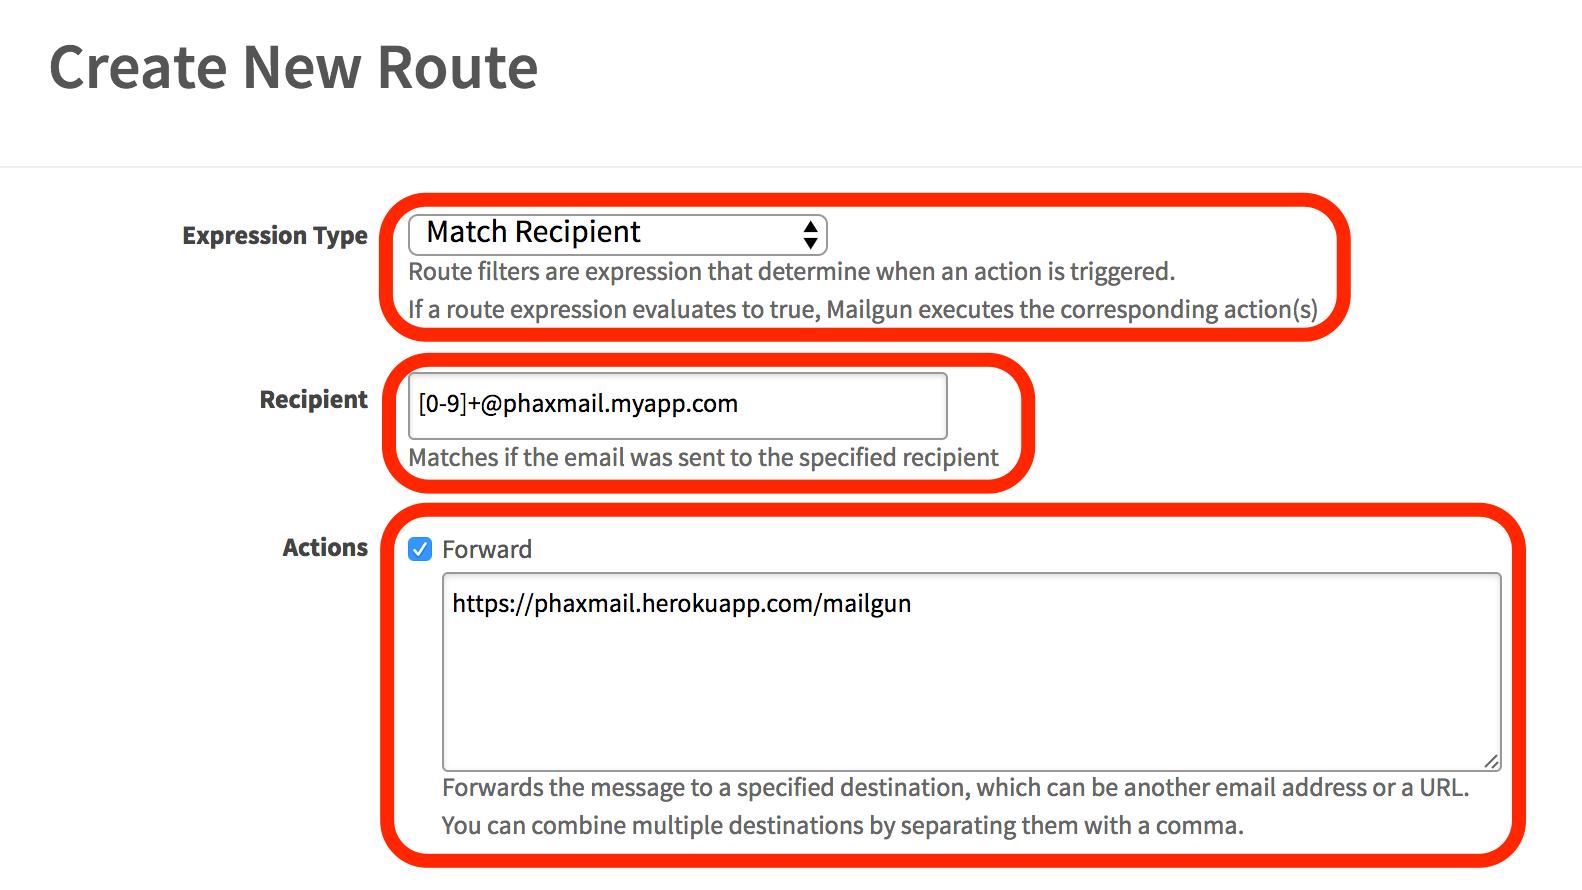 Mailgun New Route Page Screenshot 1